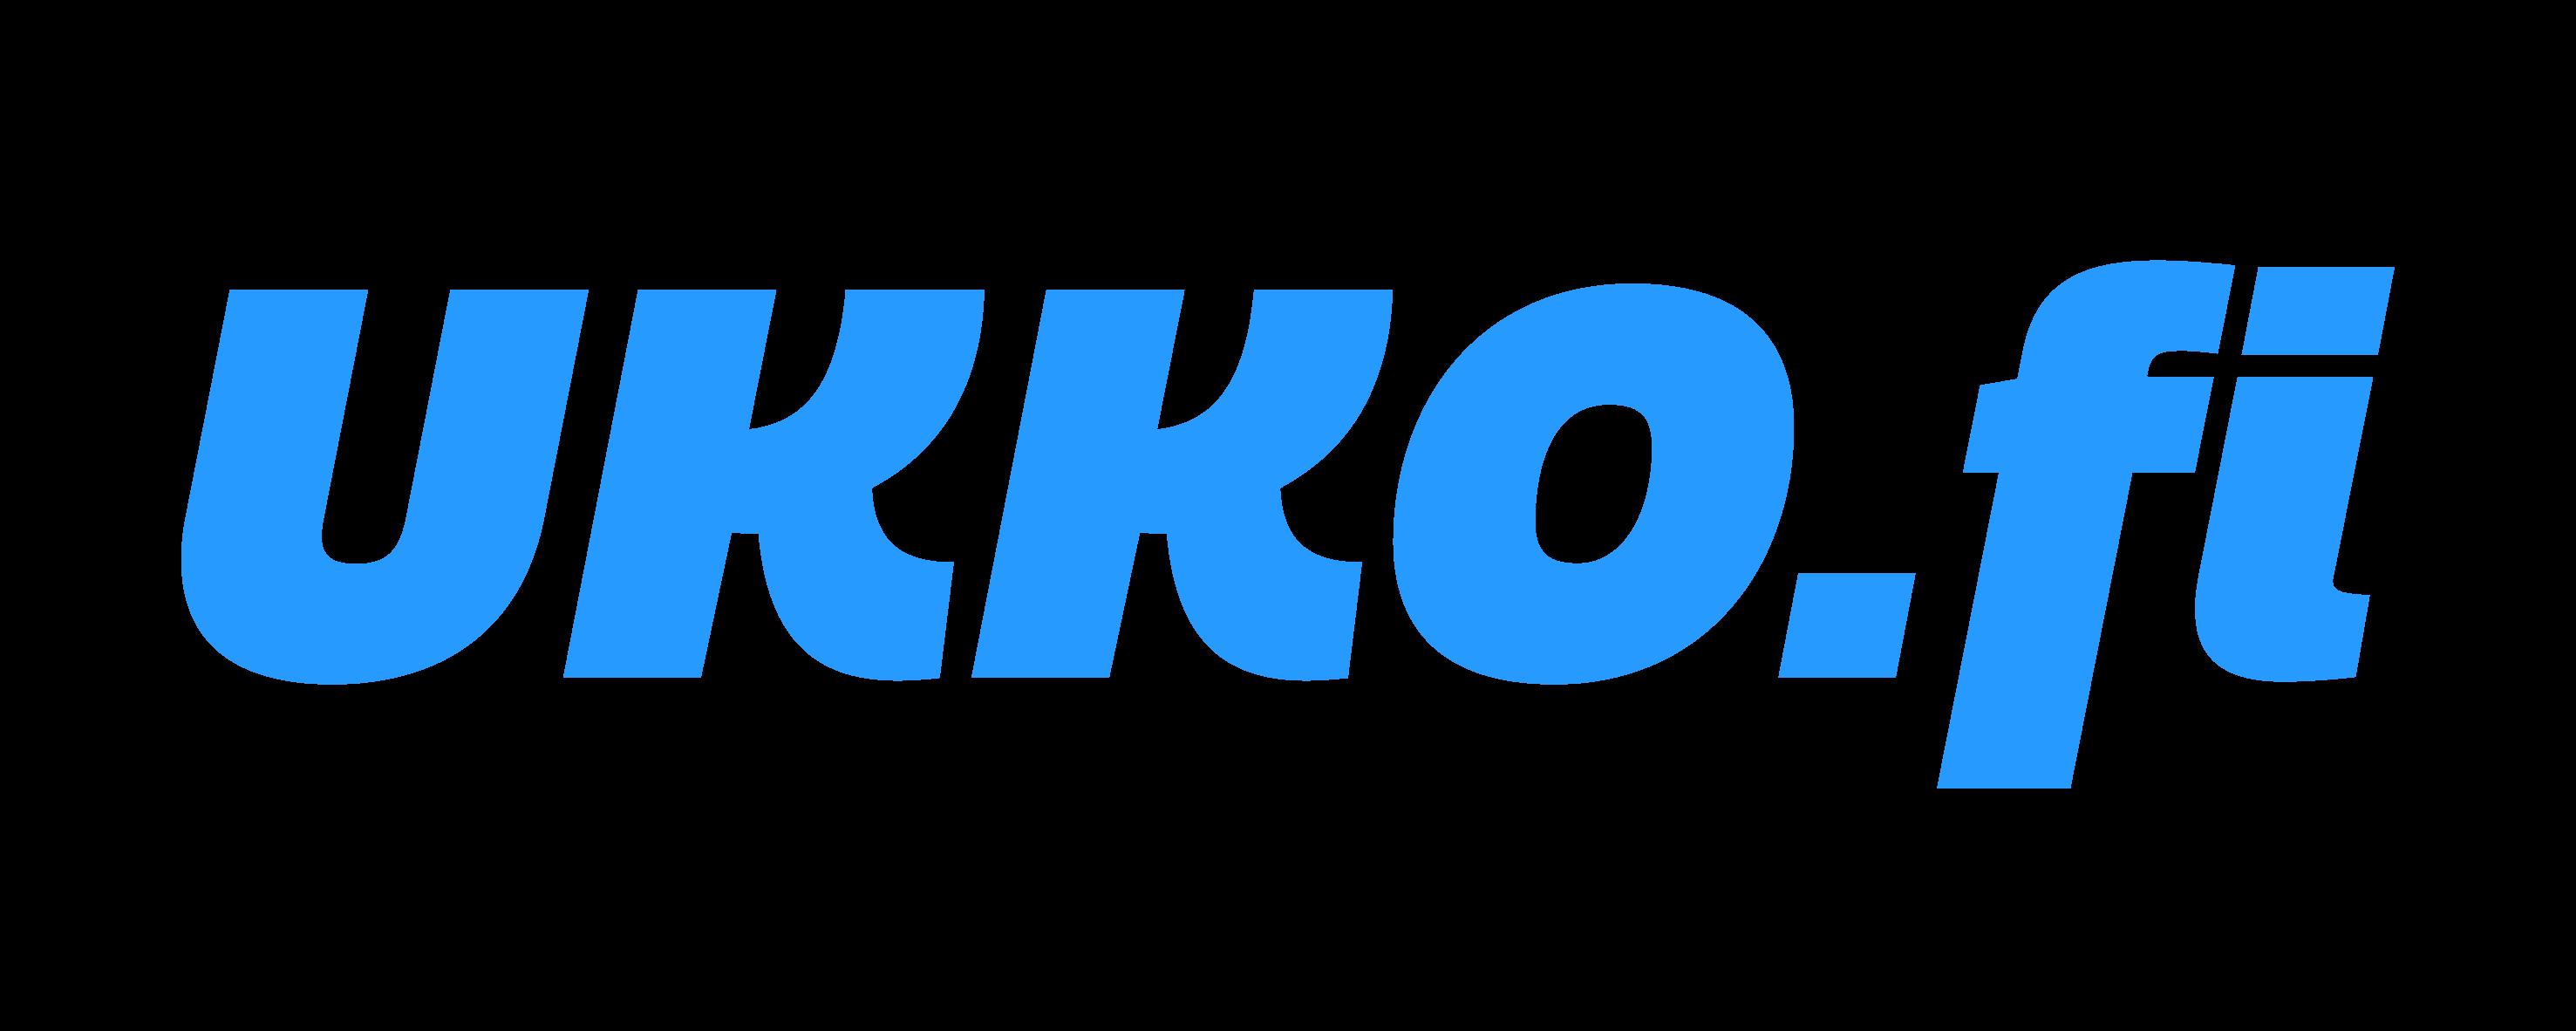 ukko-getjenny-chatbot-39